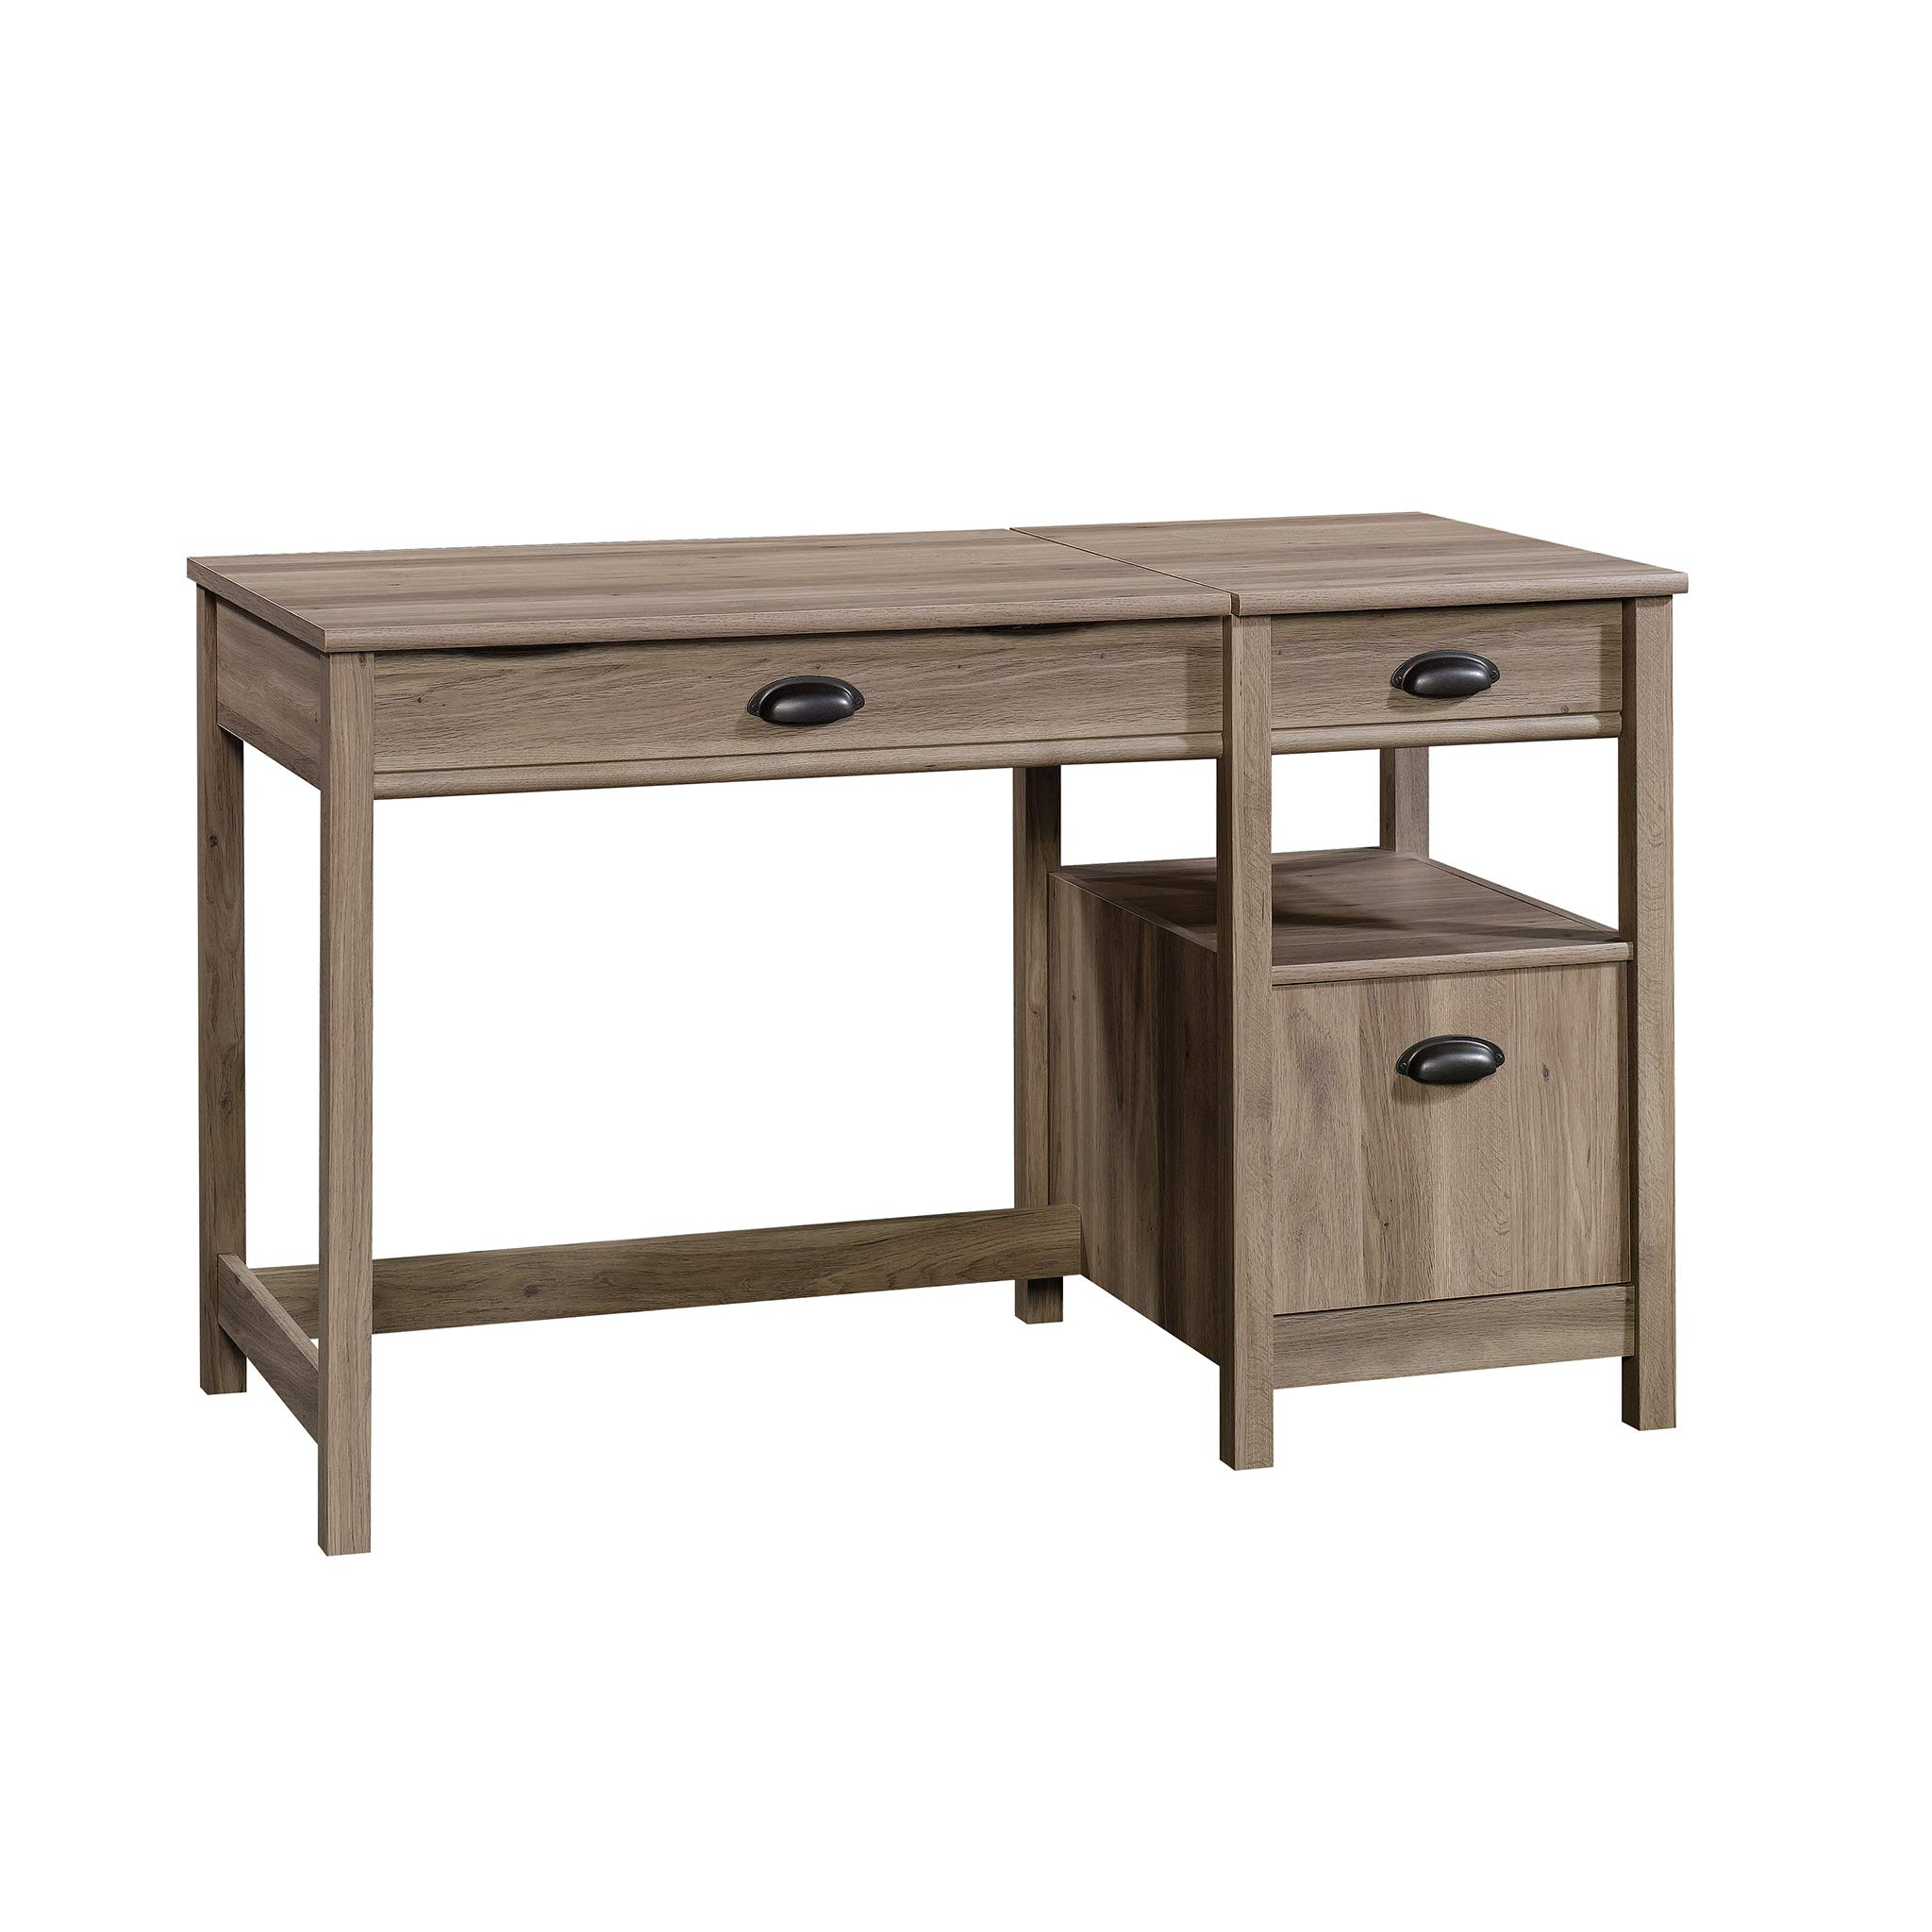 Sauder 422379 Harbor View Lift Top Desk, L: 50.00'' x W: 23.47'' x H: 30.75'', Salt Oak finish